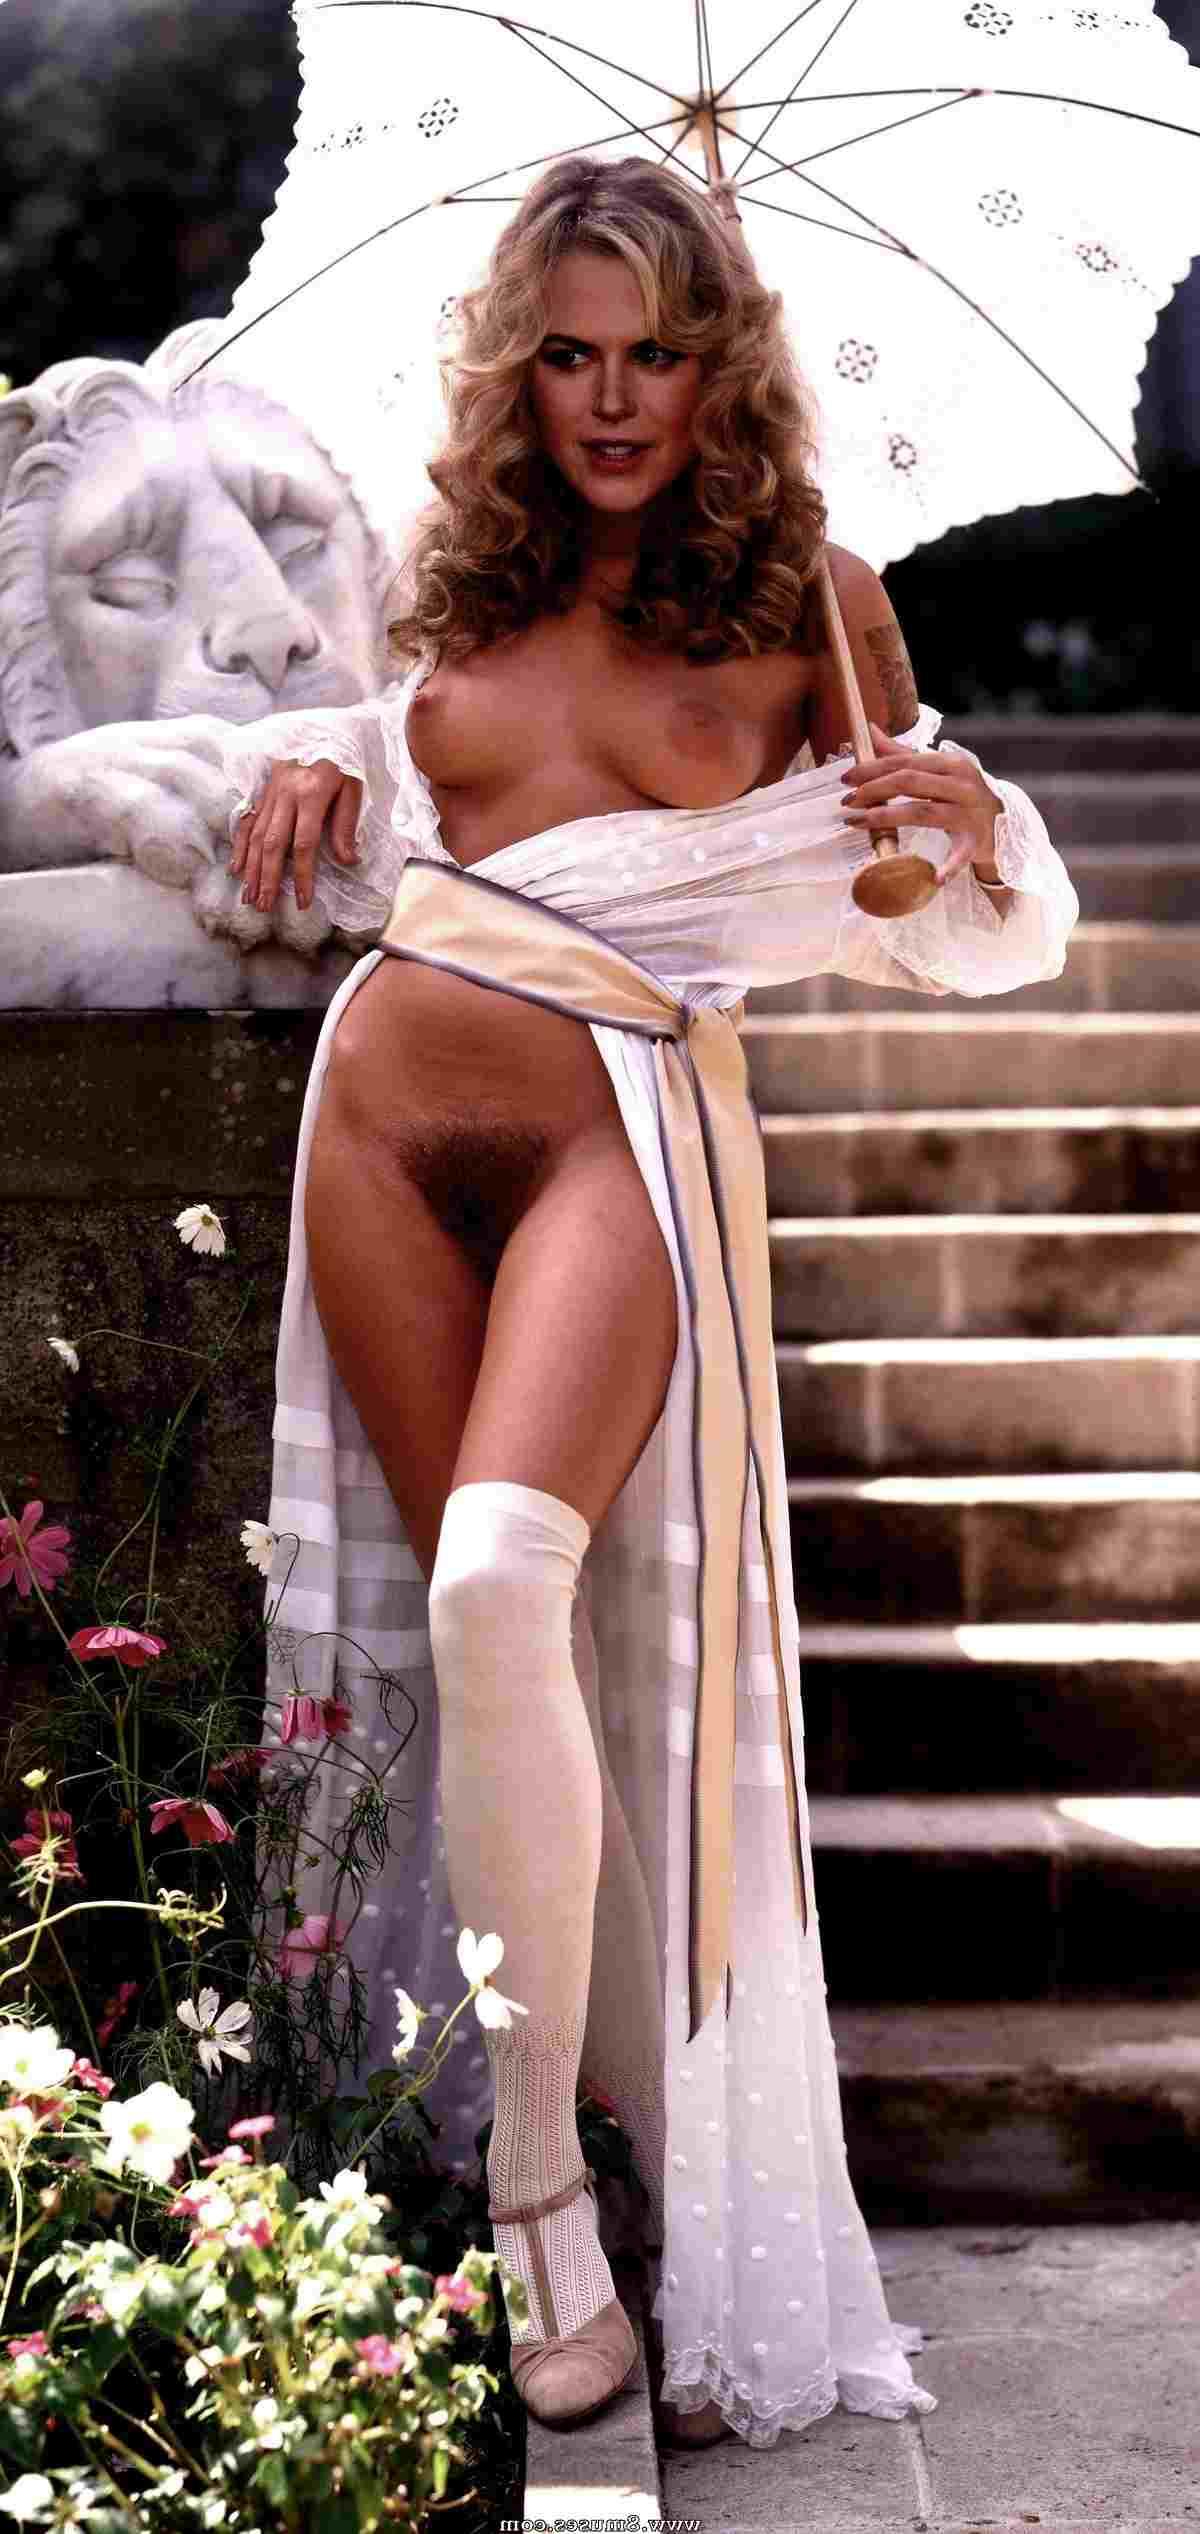 Fake-Celebrities-Sex-Pictures/Nicole-Kidman Nicole_Kidman__8muses_-_Sex_and_Porn_Comics_20.jpg